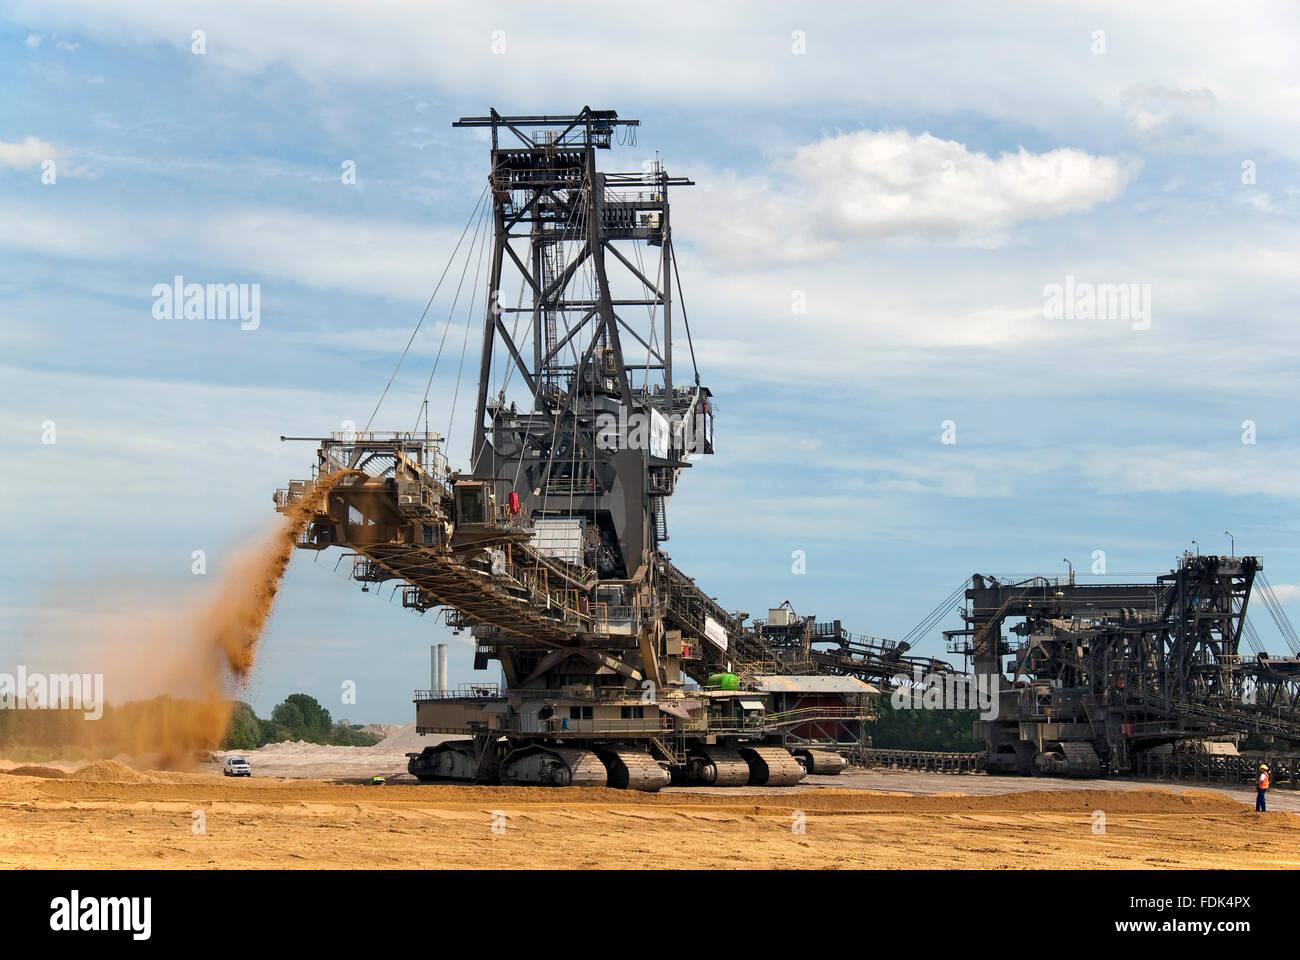 mining,weaners,drop,bandwagon - Stock Image